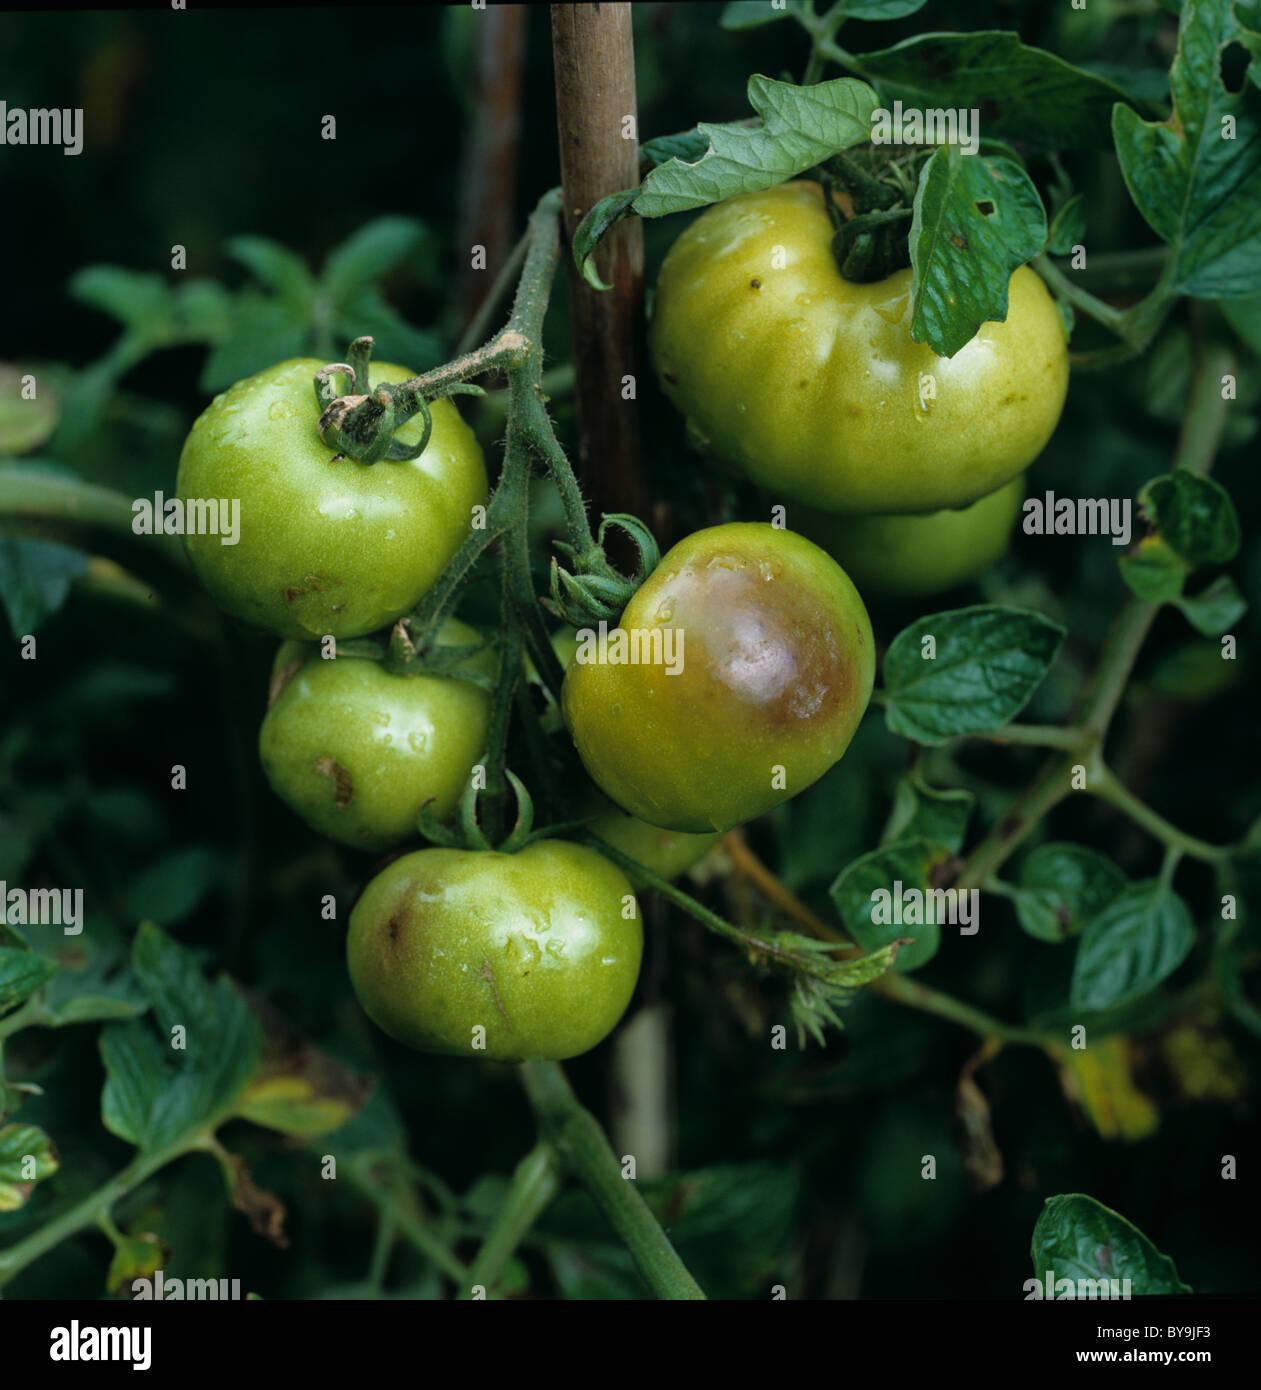 Tomato late blight (Phytophthora infestans) damage to unripe glasshouse tomatoes - Stock Image